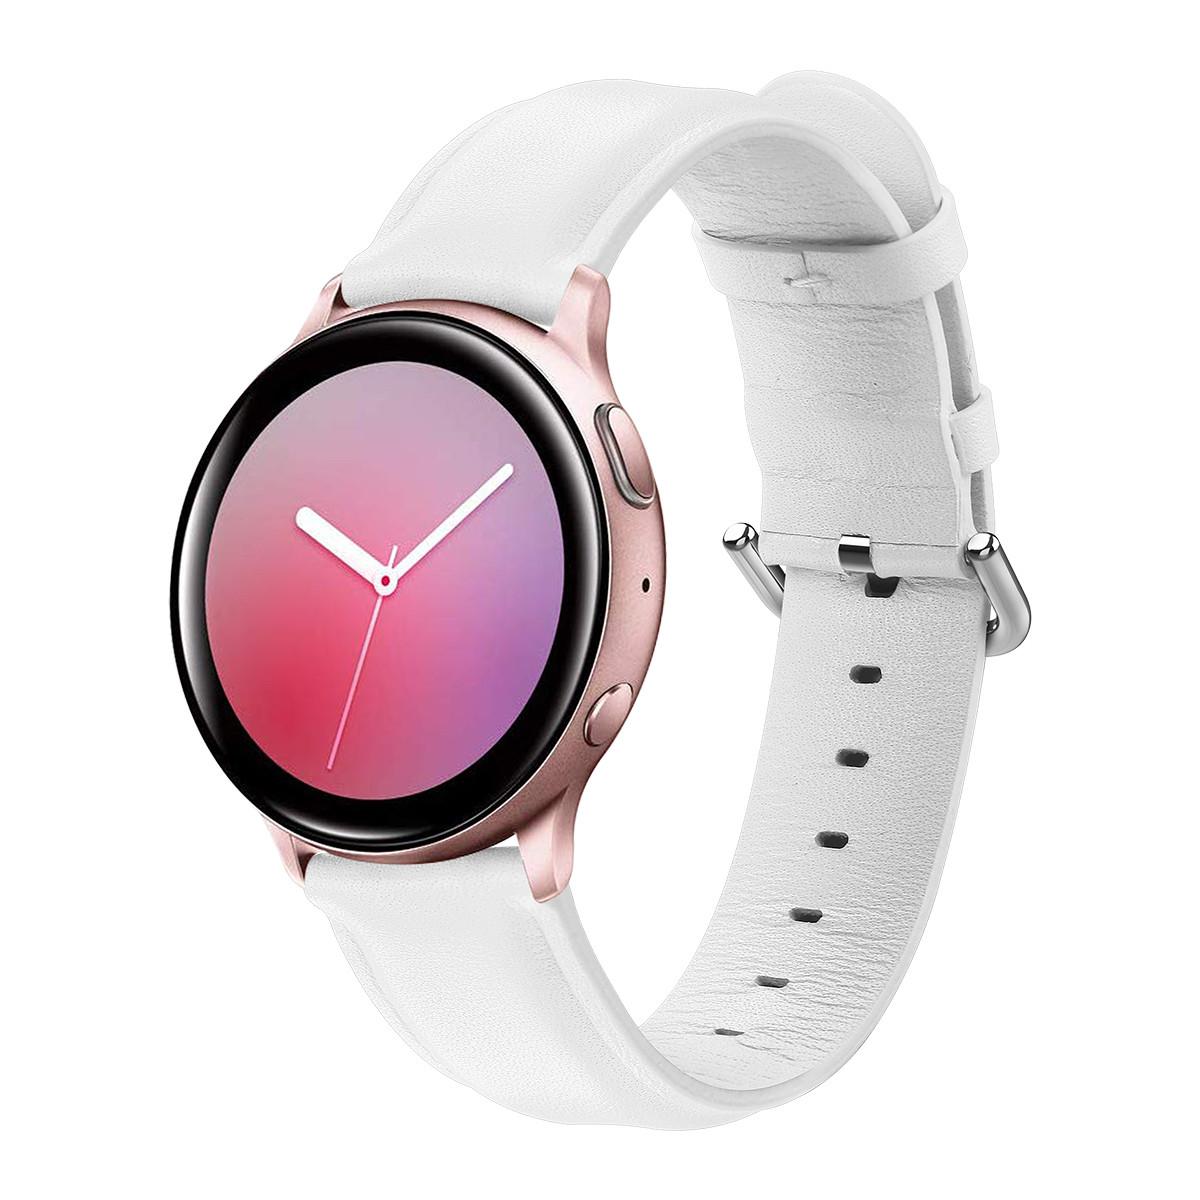 Ремінець BeWatch шкіряний 20мм для Samsung Active | Active 2 | Galaxy watch 42mm Білий S (1220102.S)